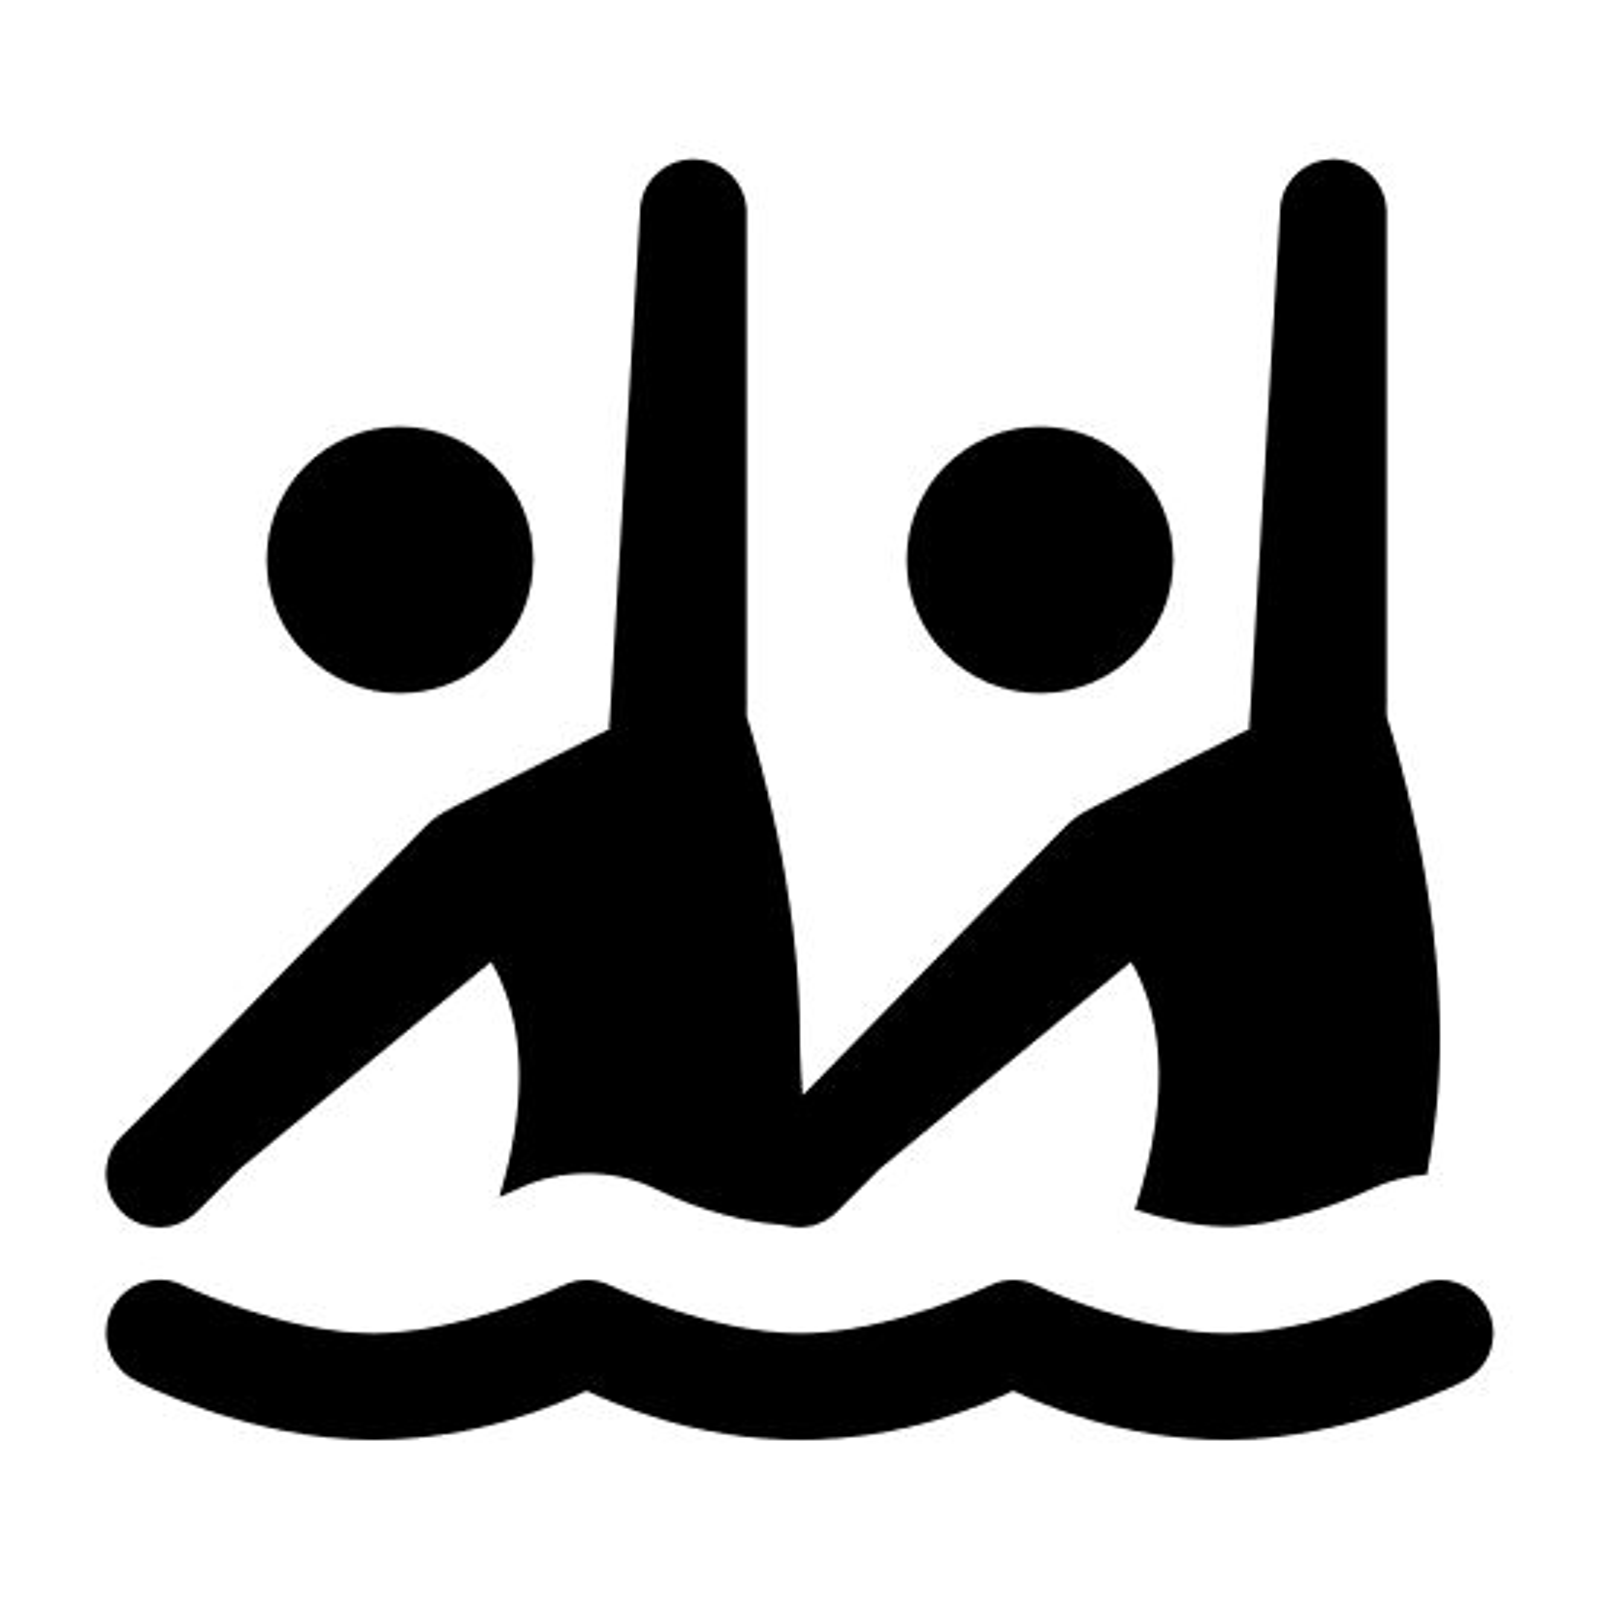 Nado sincronizado icon